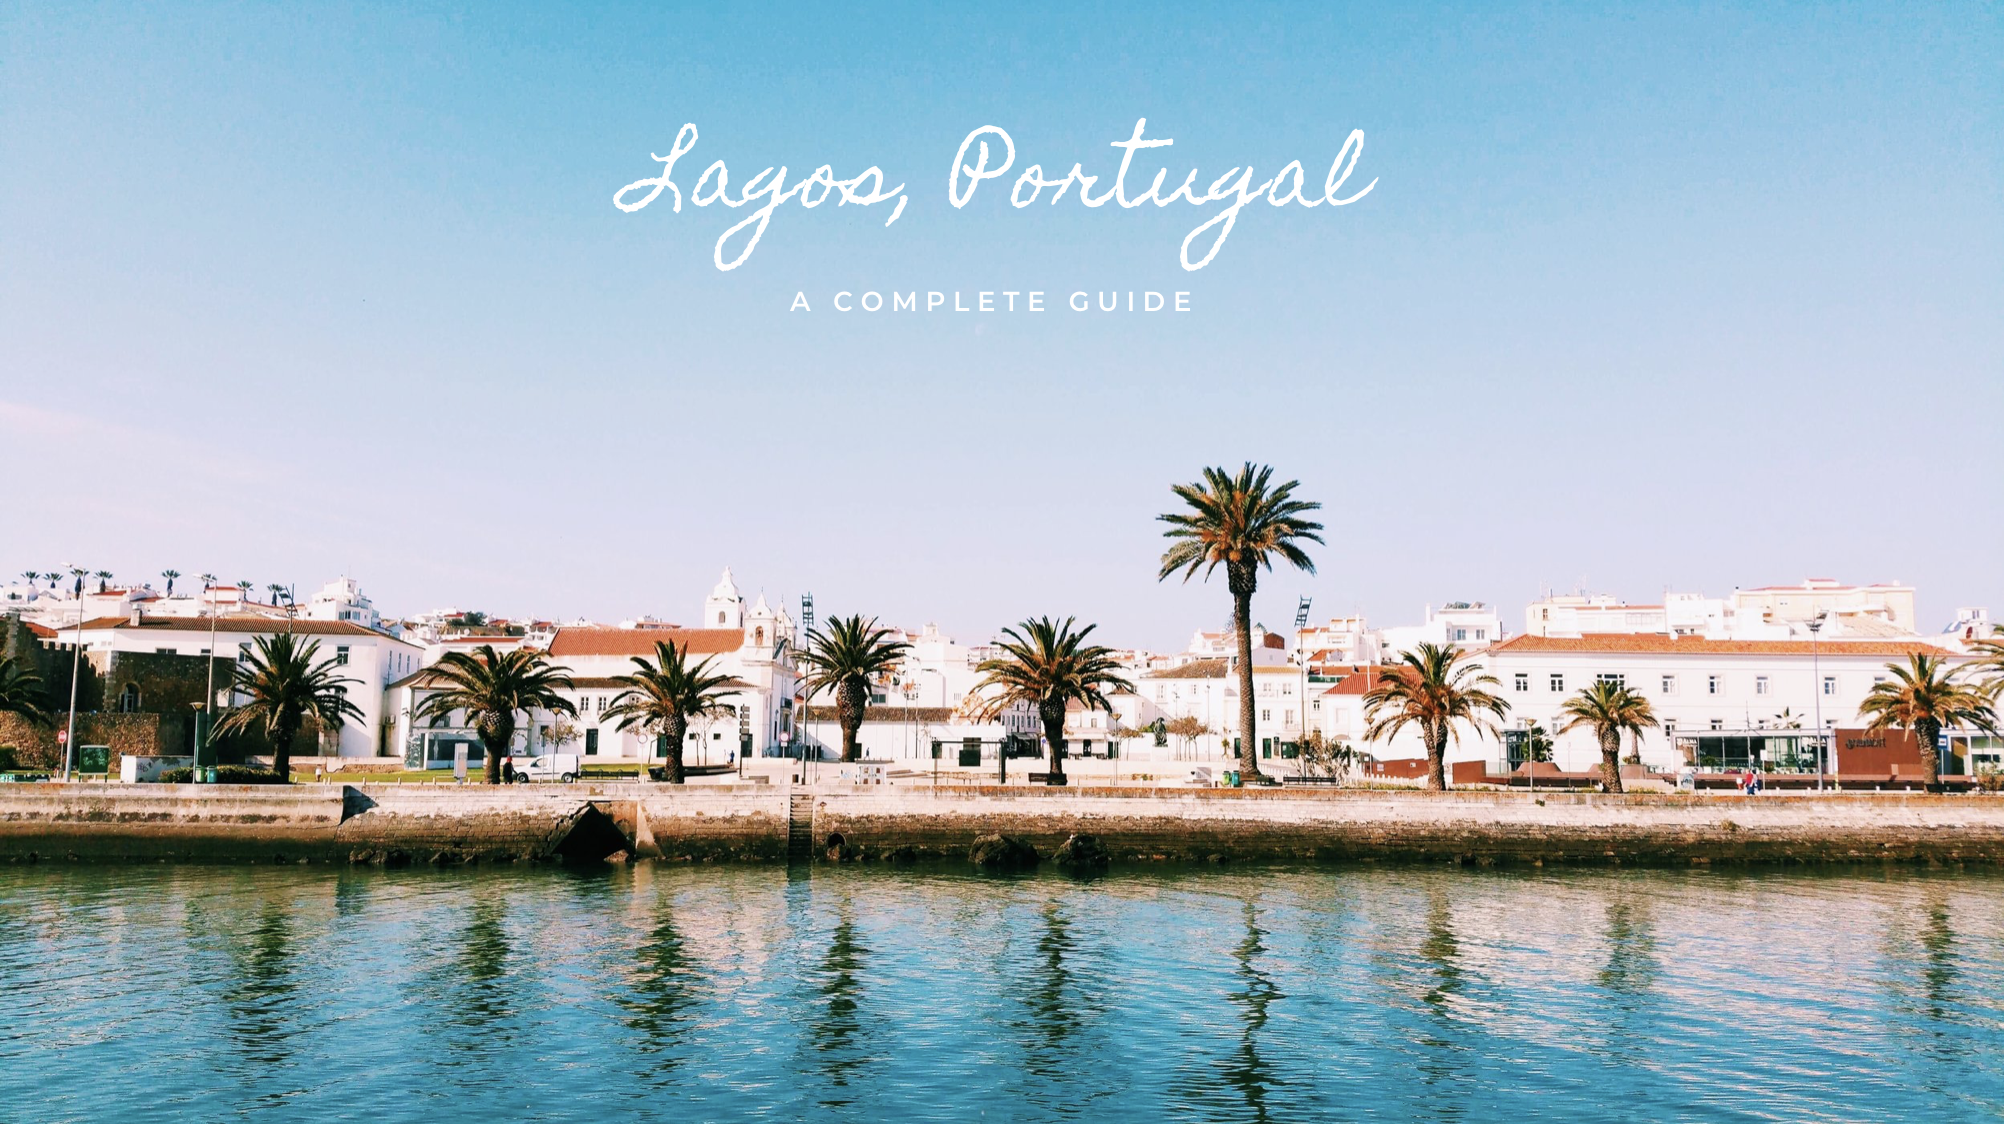 Lagos-Portugal-travel-guide.jpg